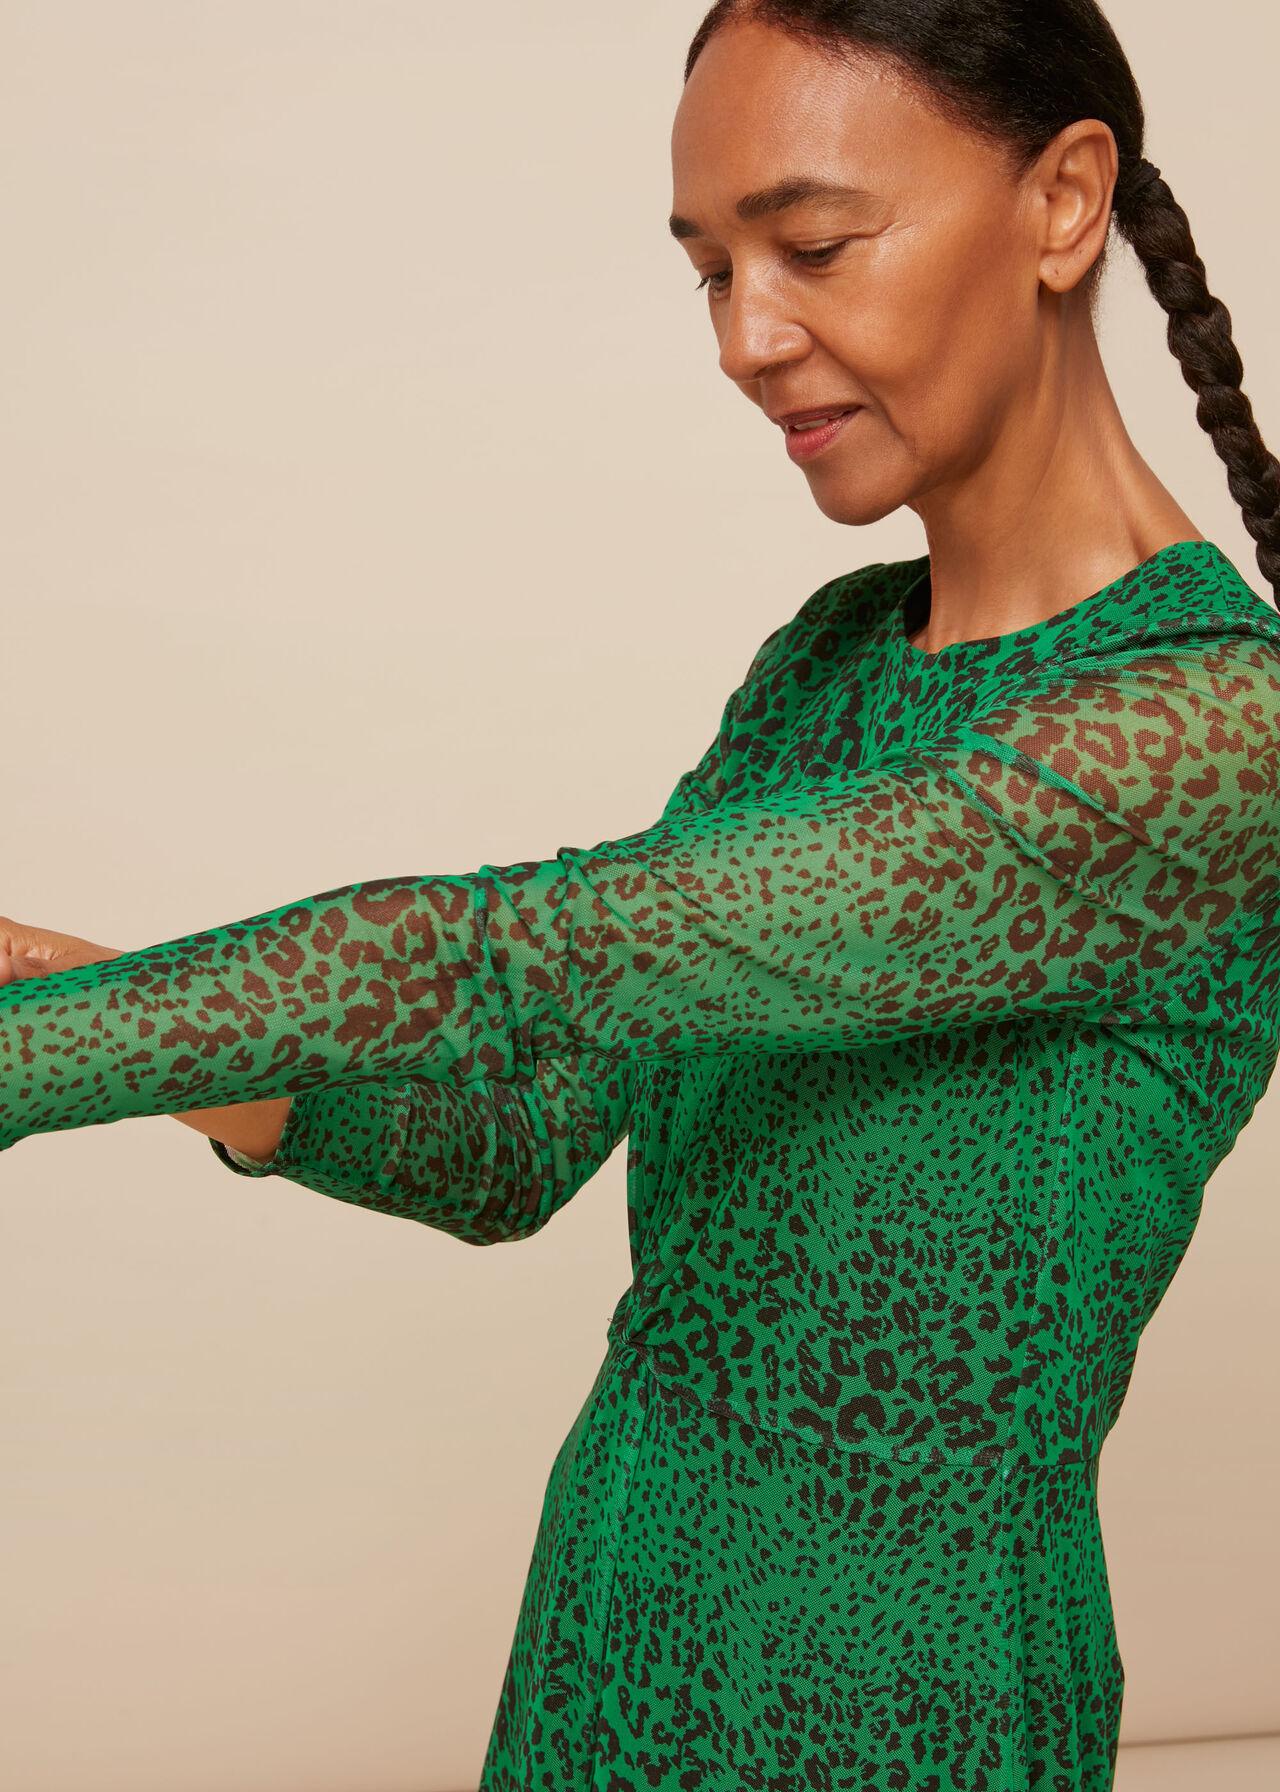 Speckled Animal Mesh Dress